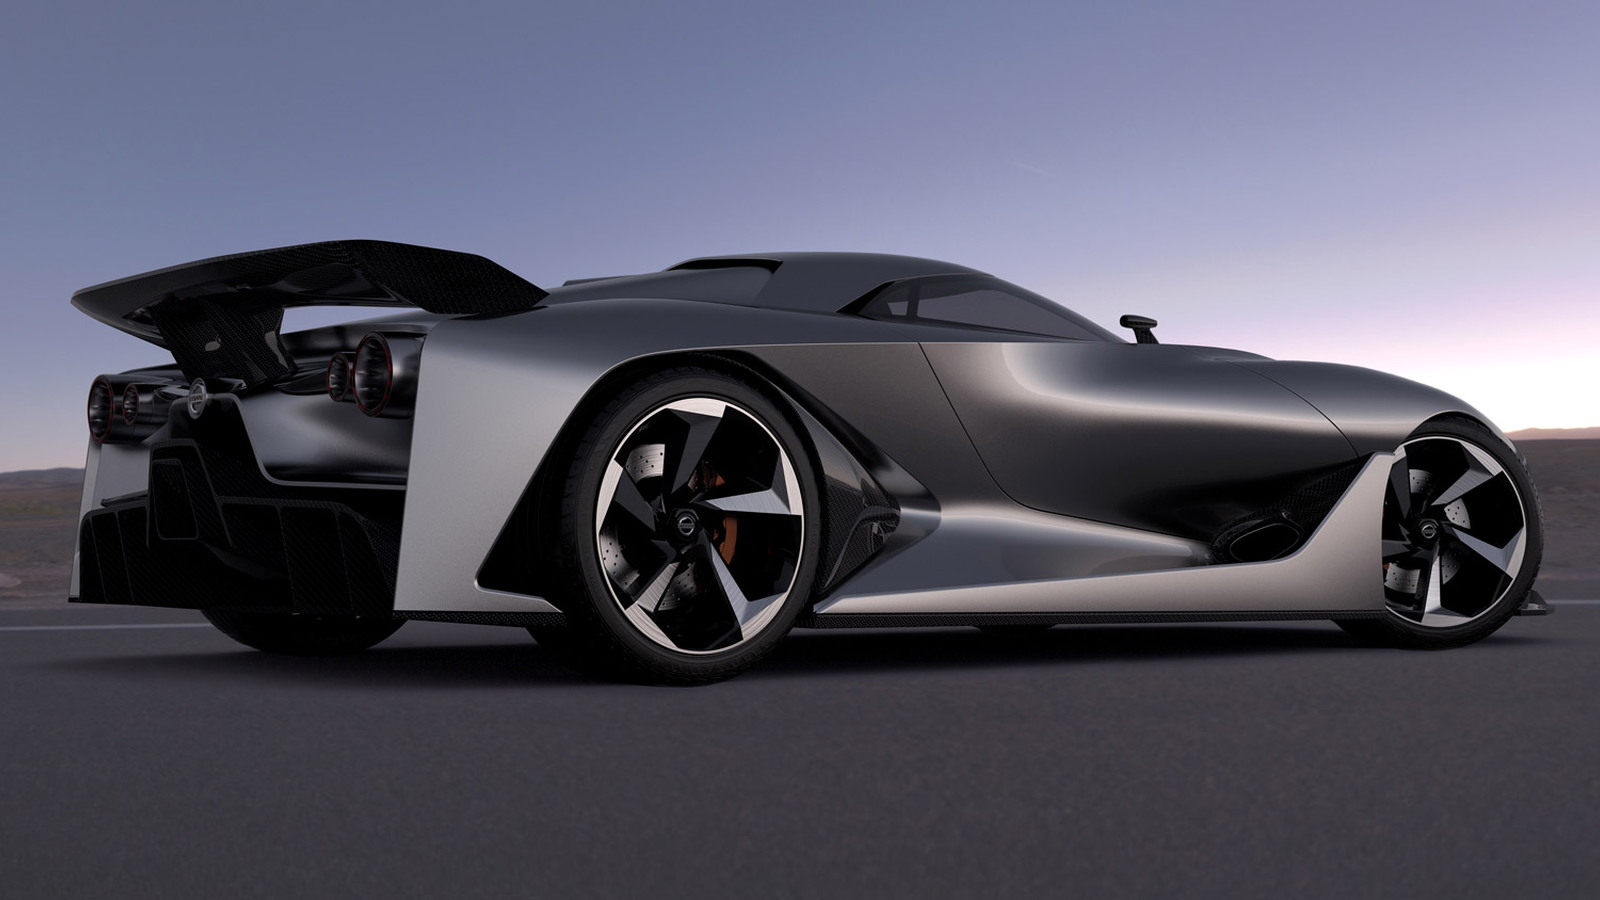 nissan concept 2020 vision gt revealed